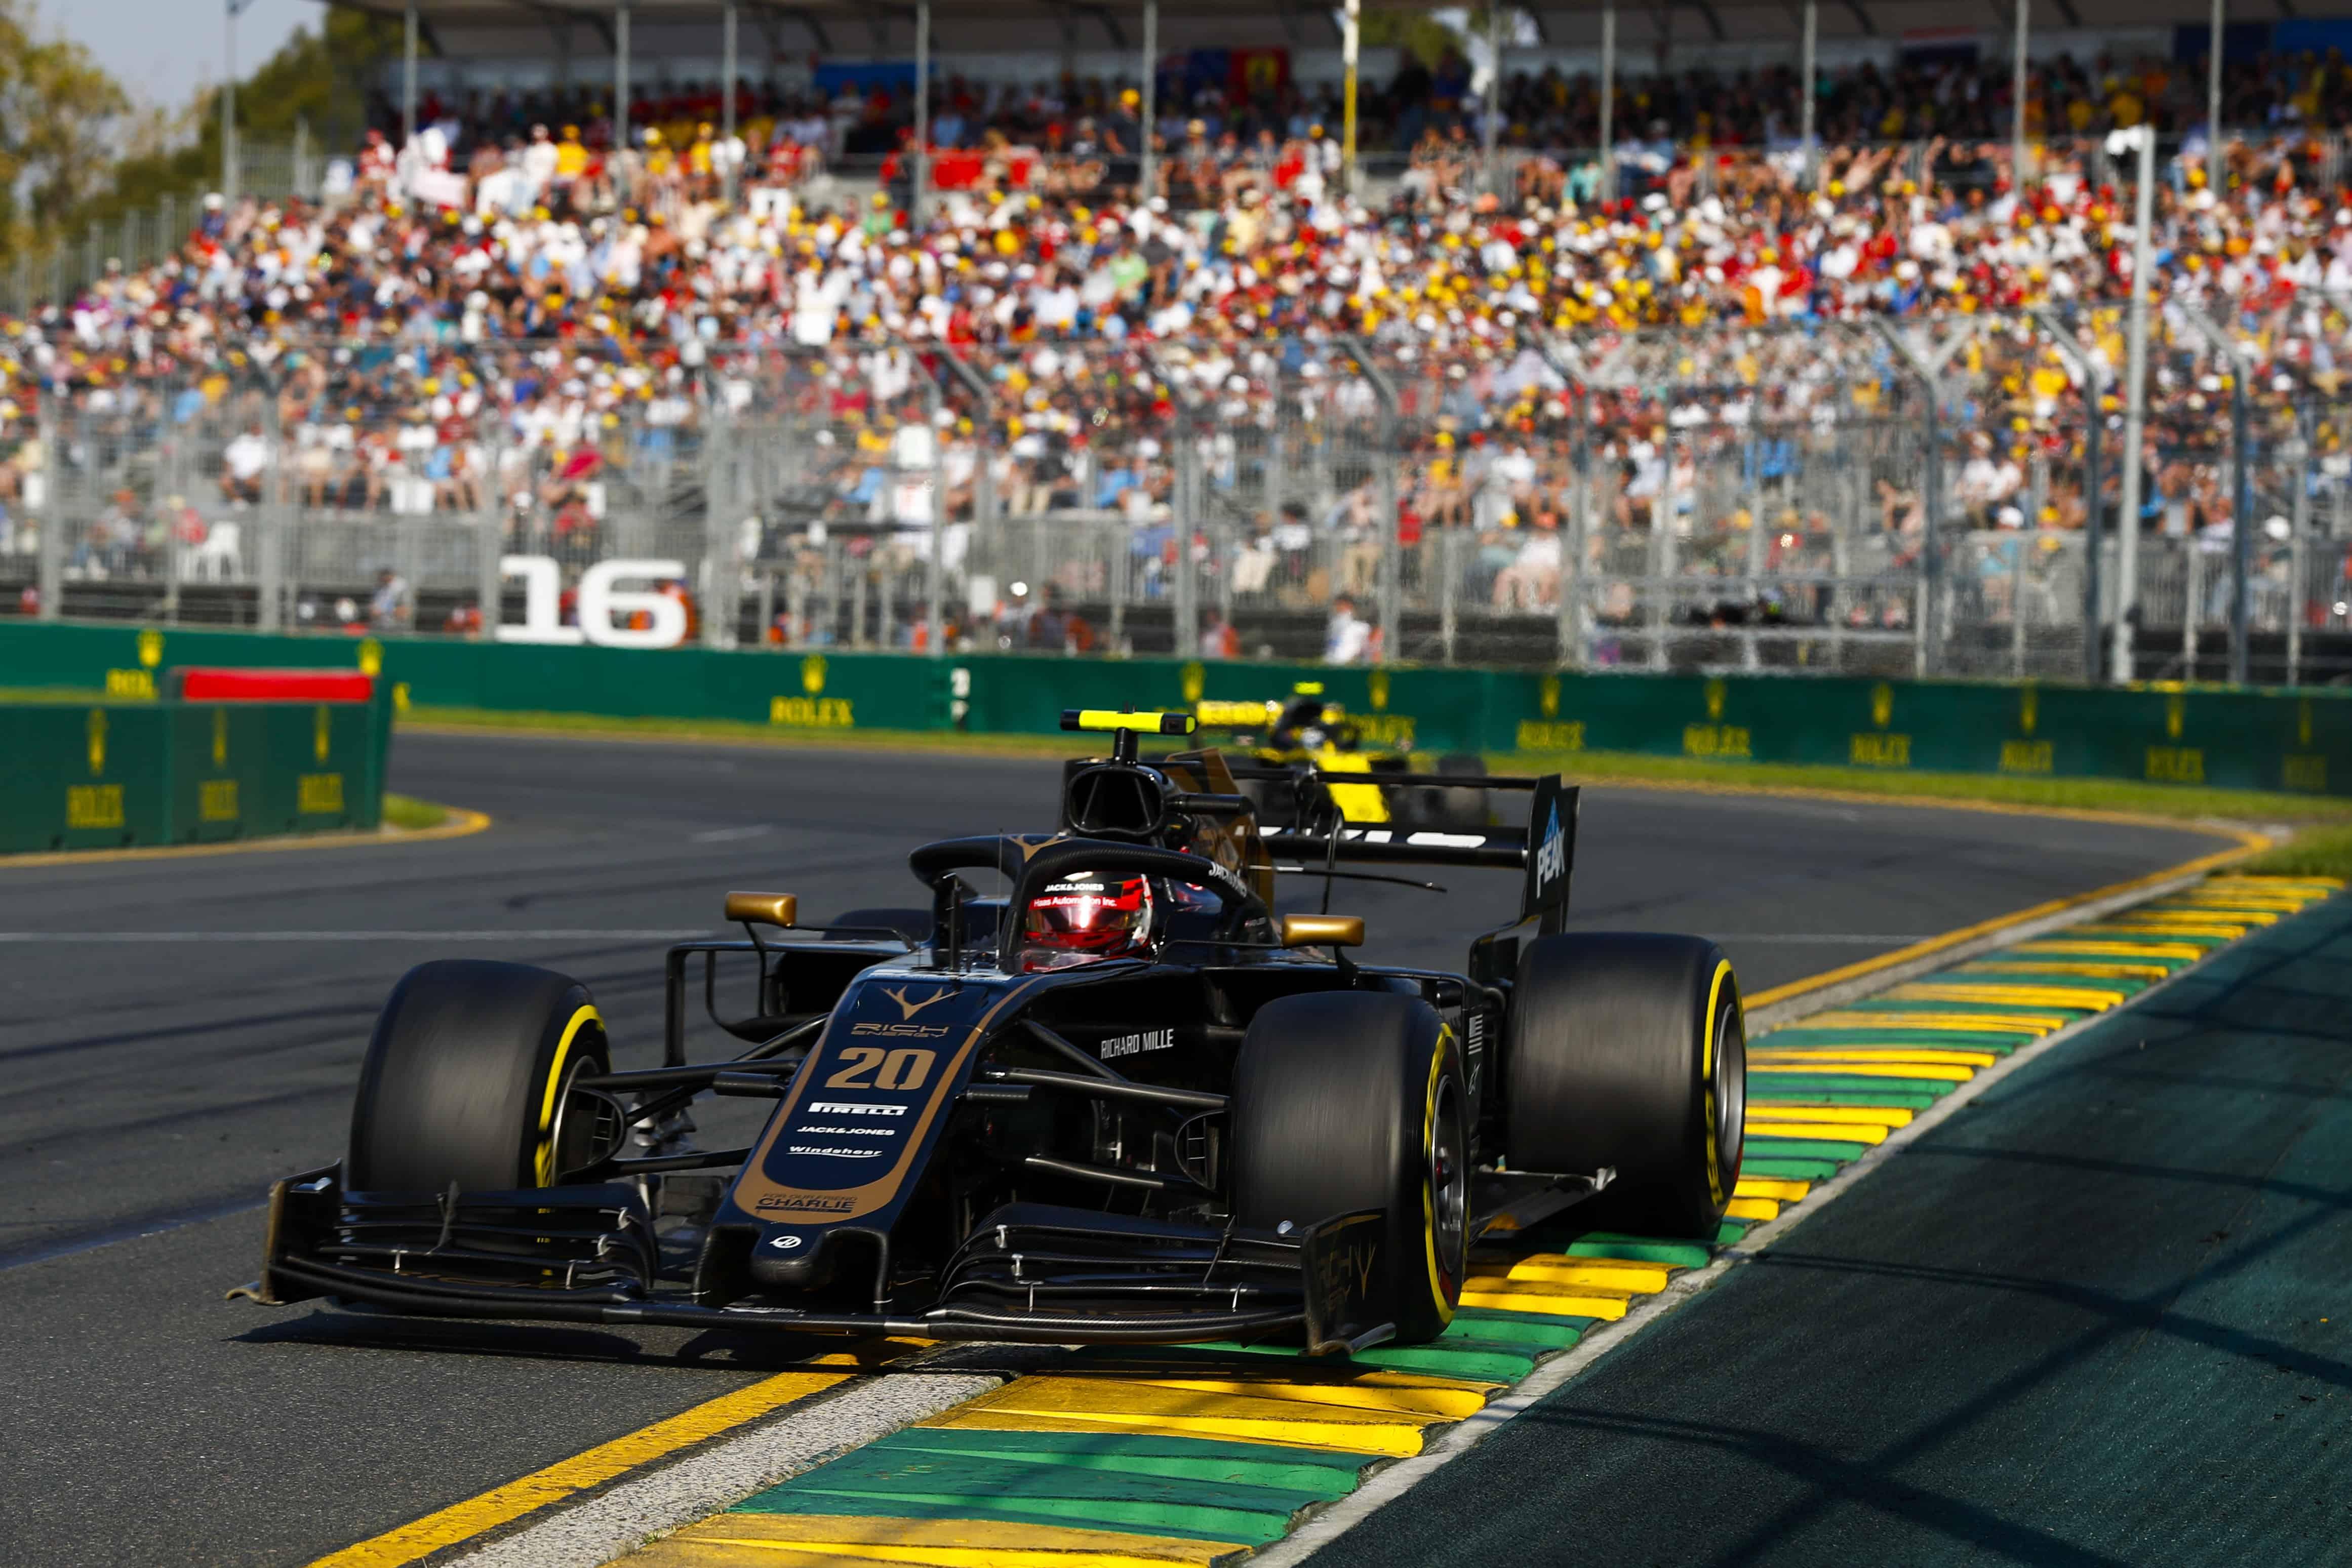 Kevin Magnussen Haas 2019 Australian GP F1 2019 race Photo Haas